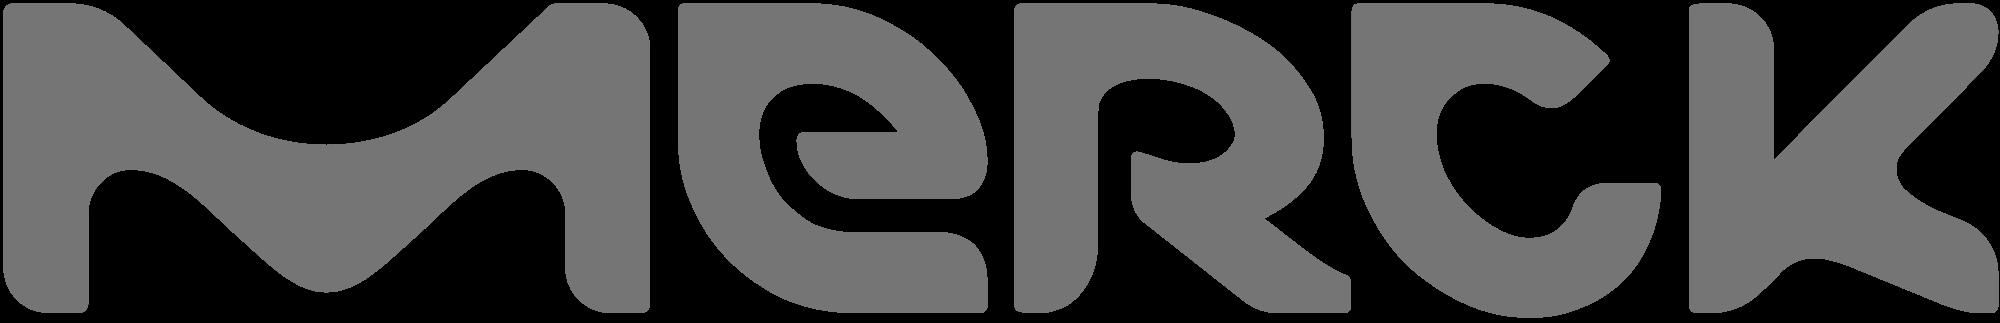 2000px-Logo_Merck_KGaA_2015.png